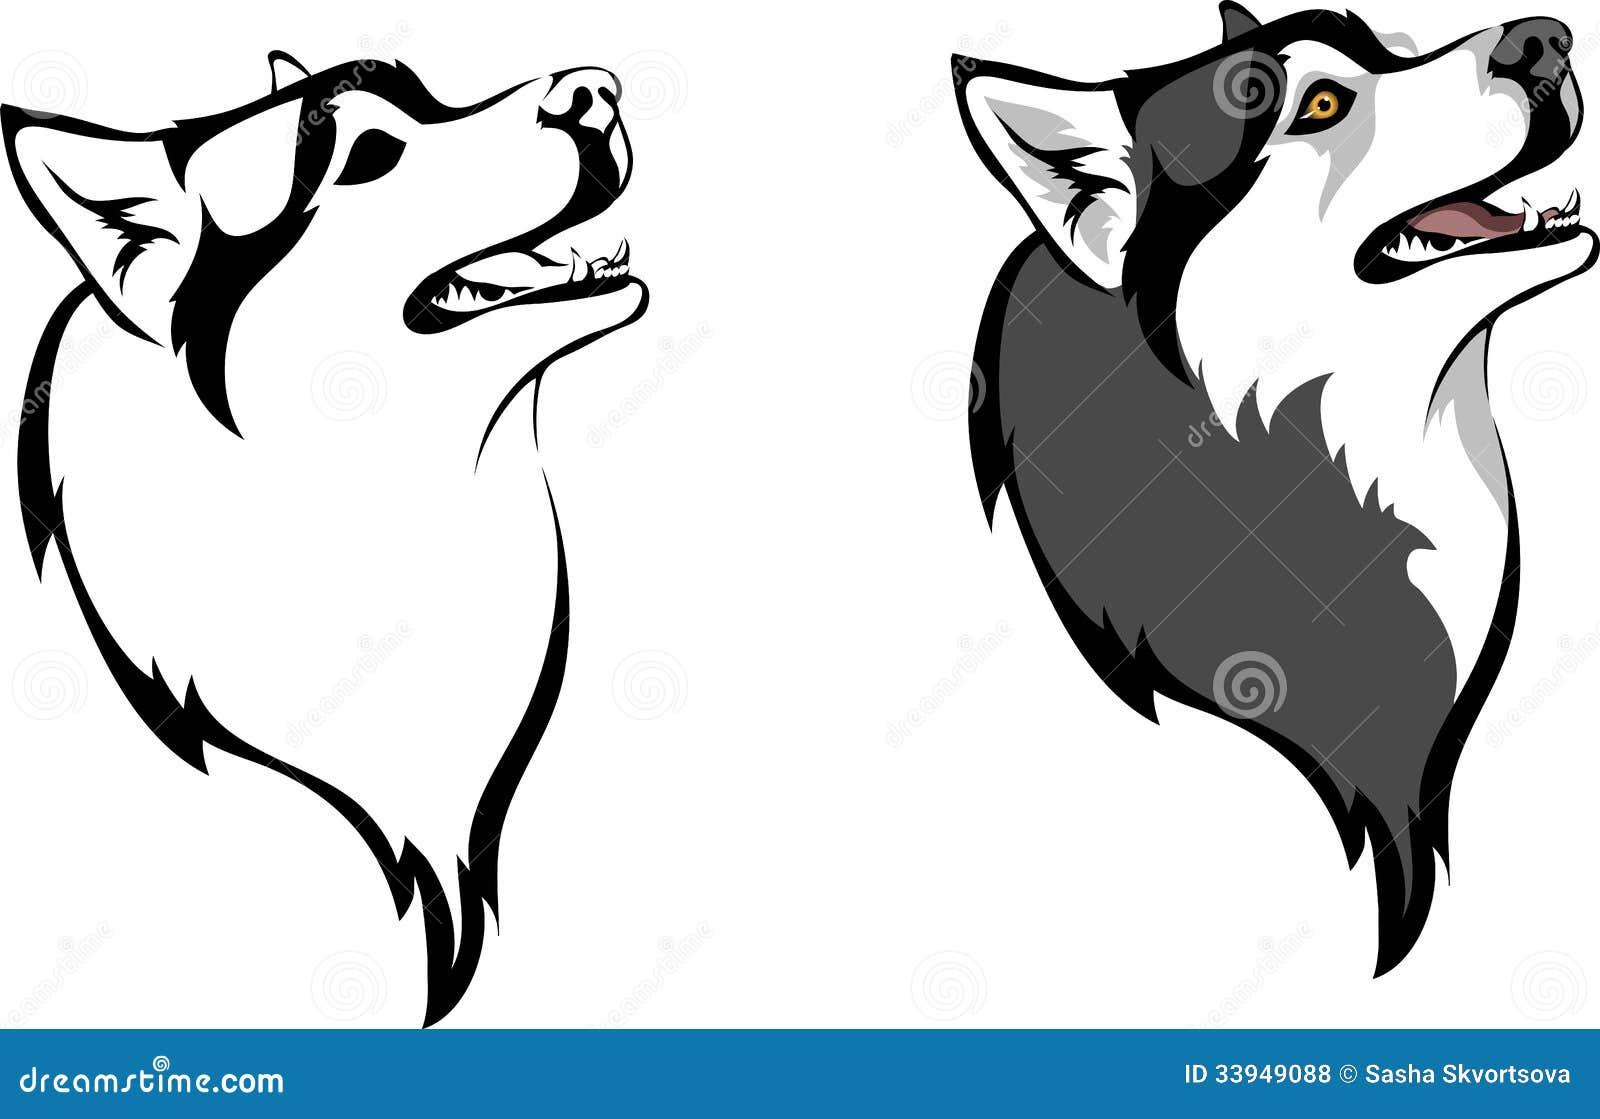 Siberian Husky Royalty Free Stock Photos - Image: 33949088